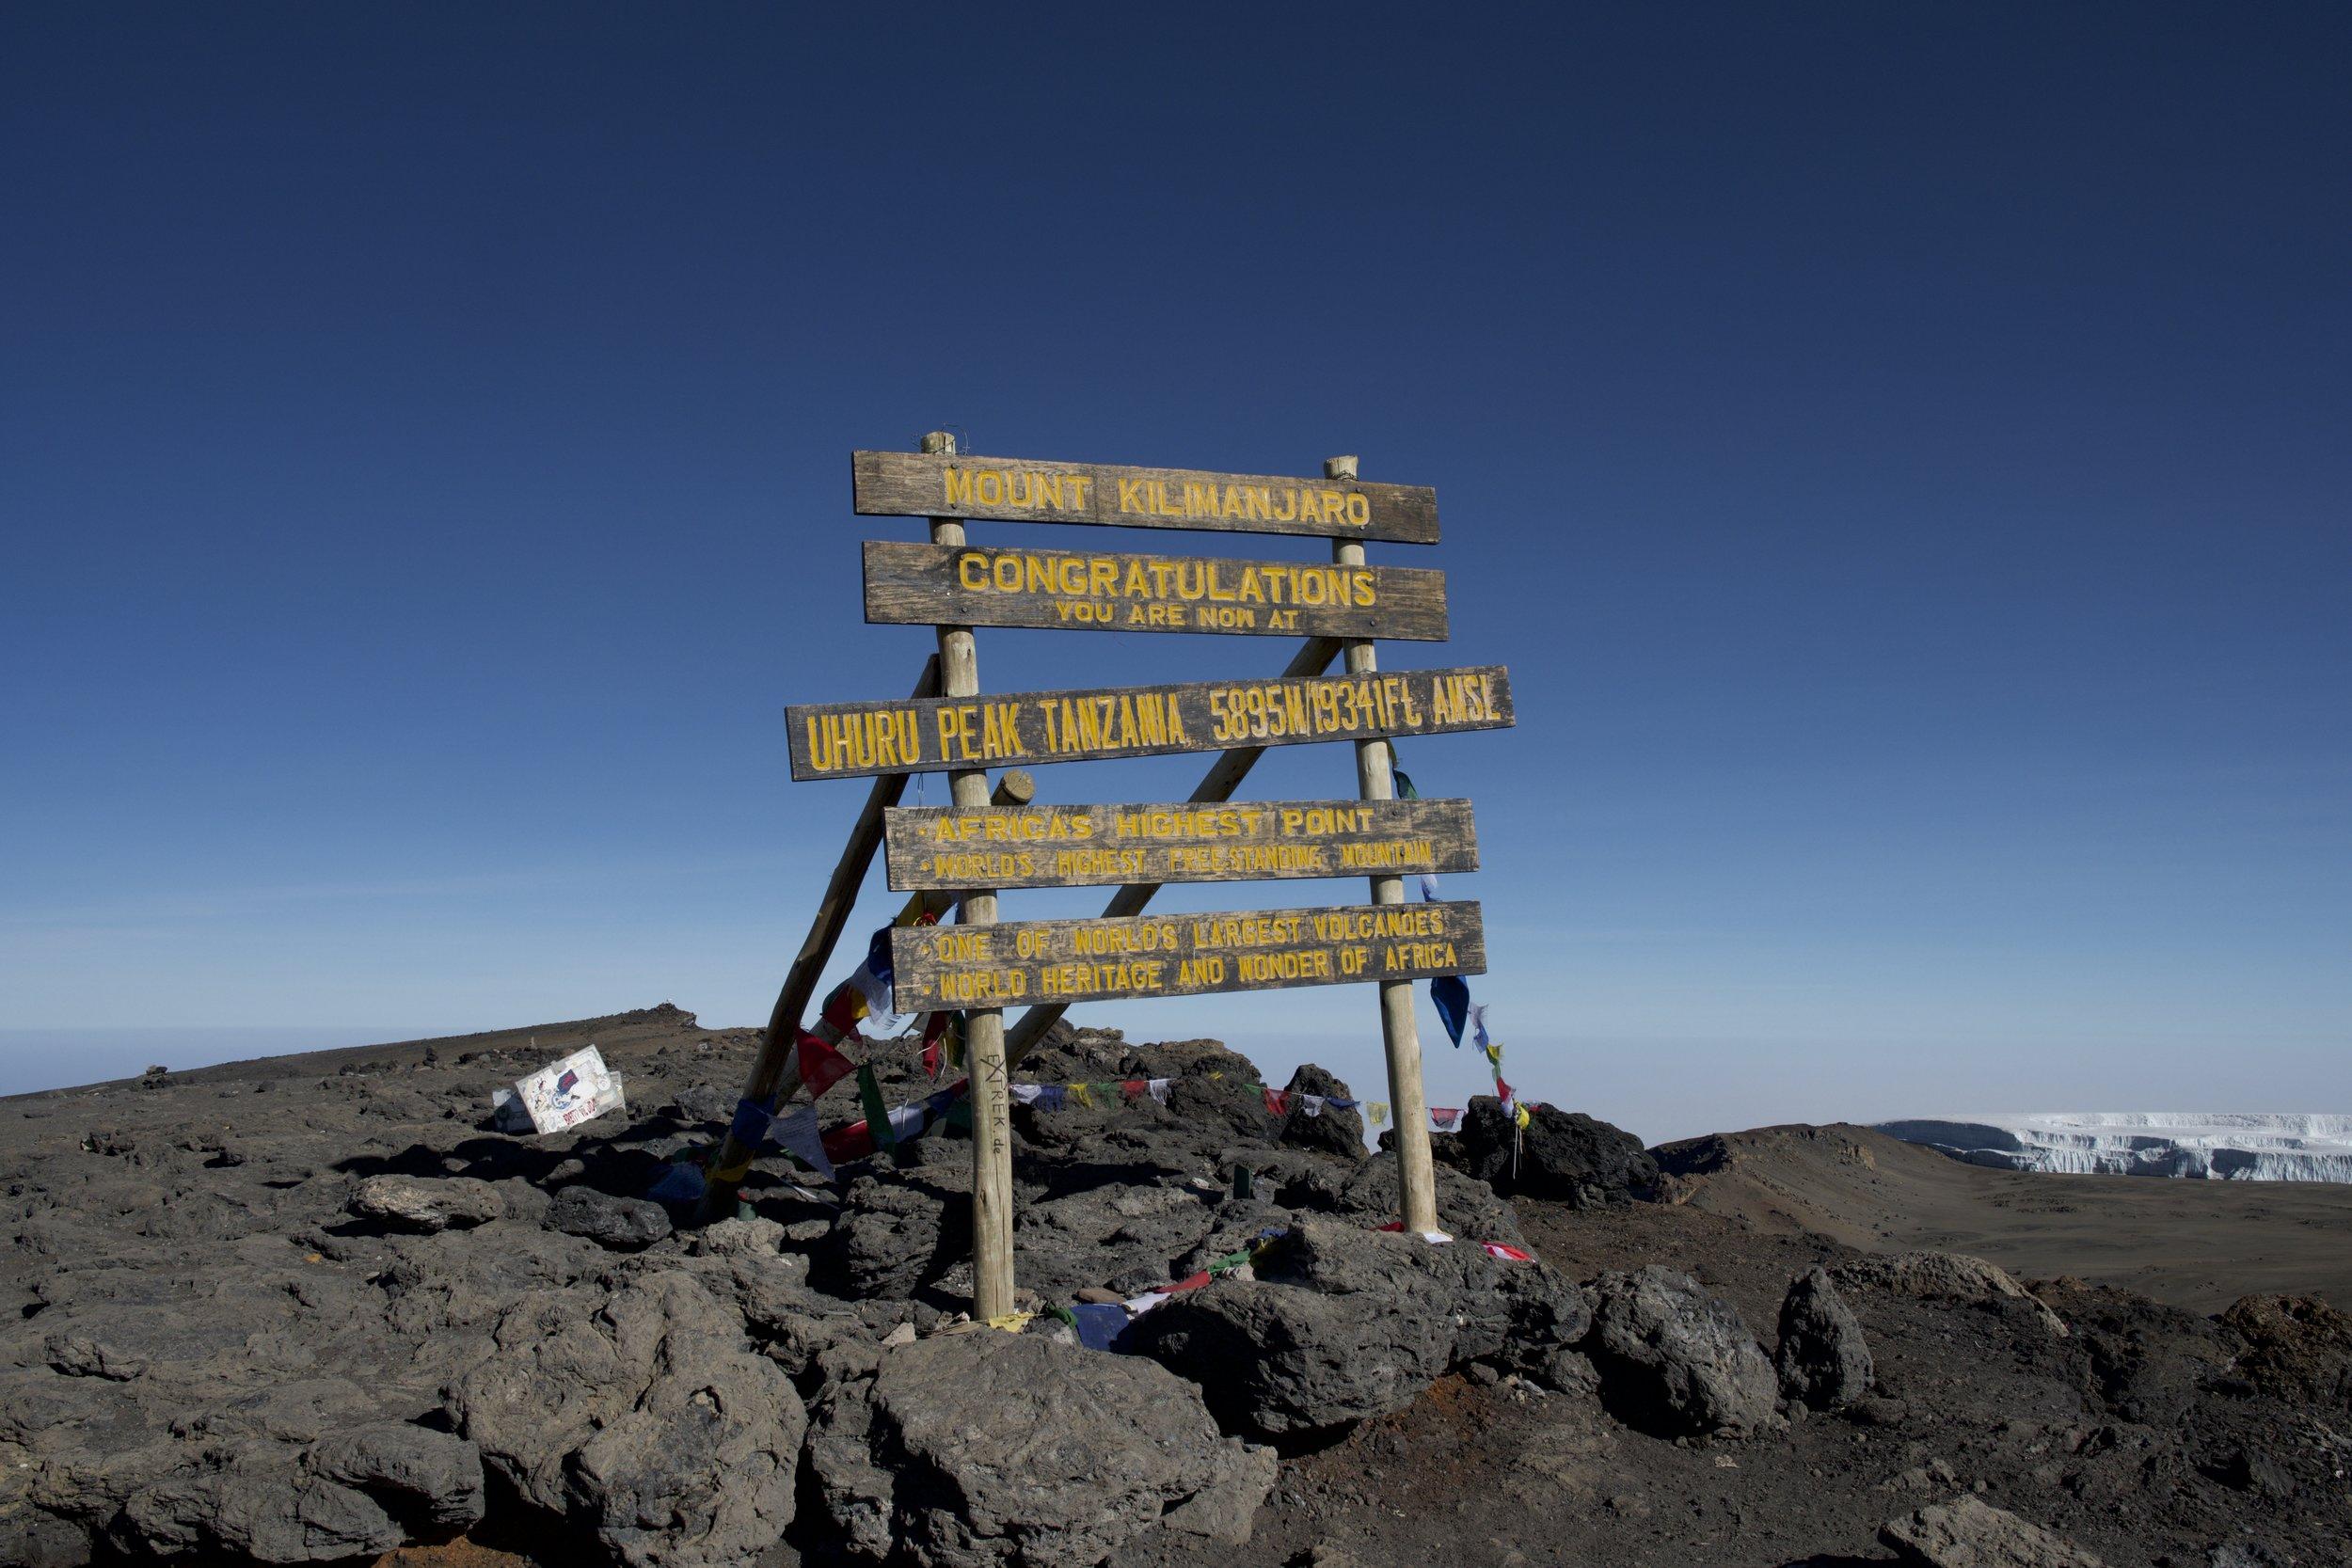 Day 8 / Uhuru Peak